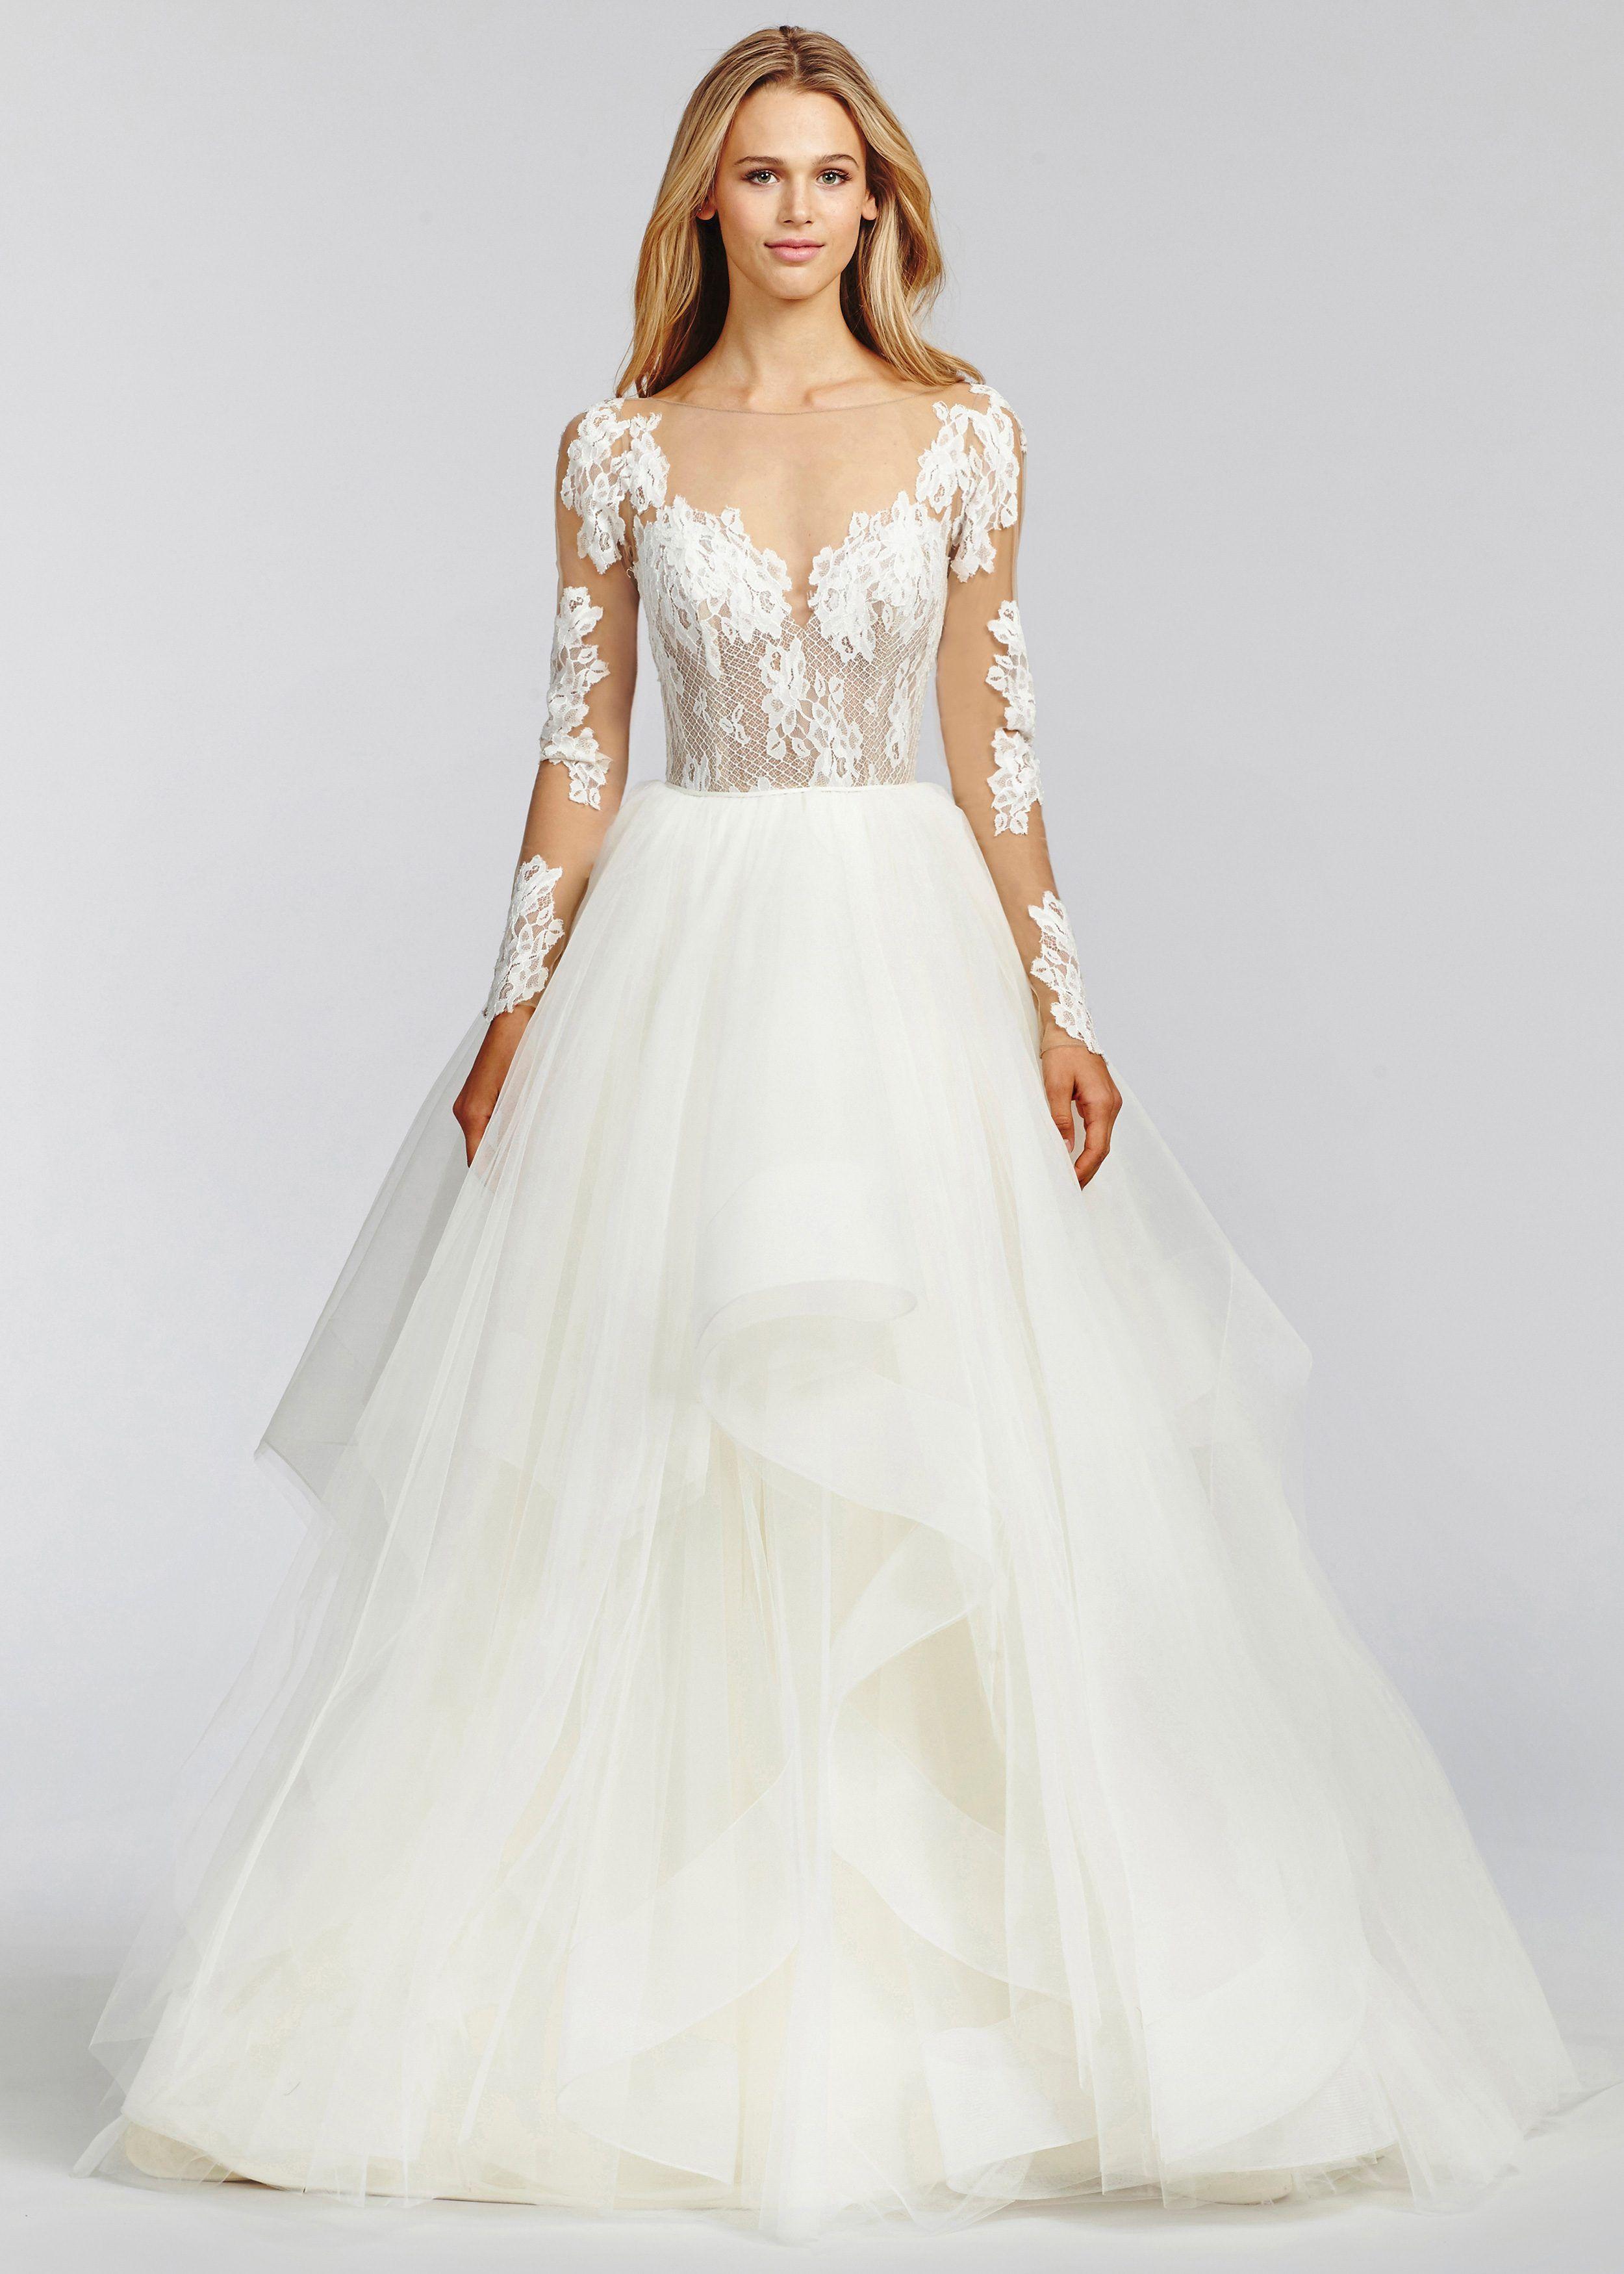 b2a0fec6e Blush by Hayley Paige 1652 Pippa | Hopeless romantic | Wedding ...